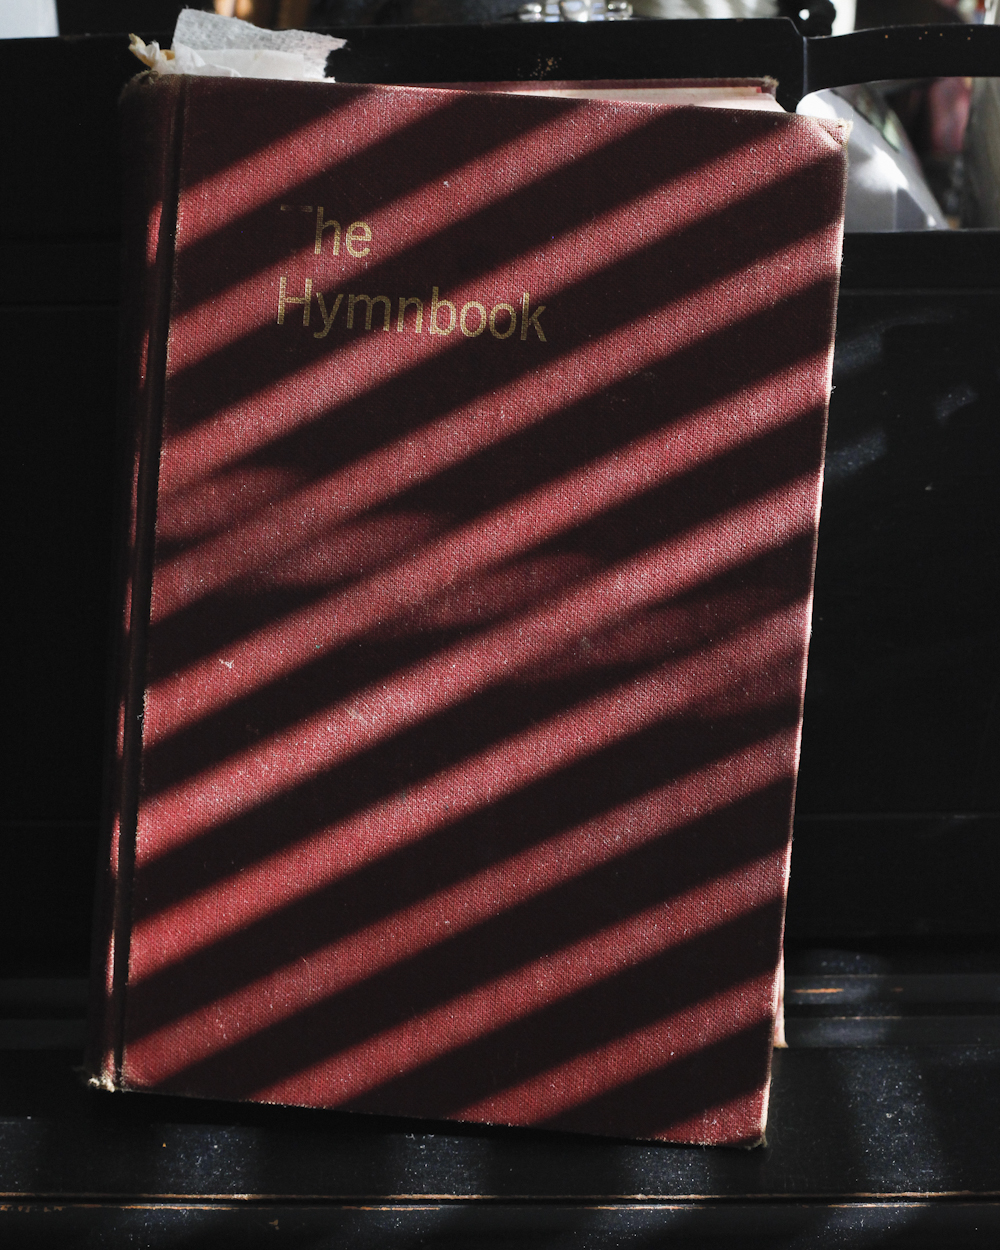 d_hymnbook.jpg